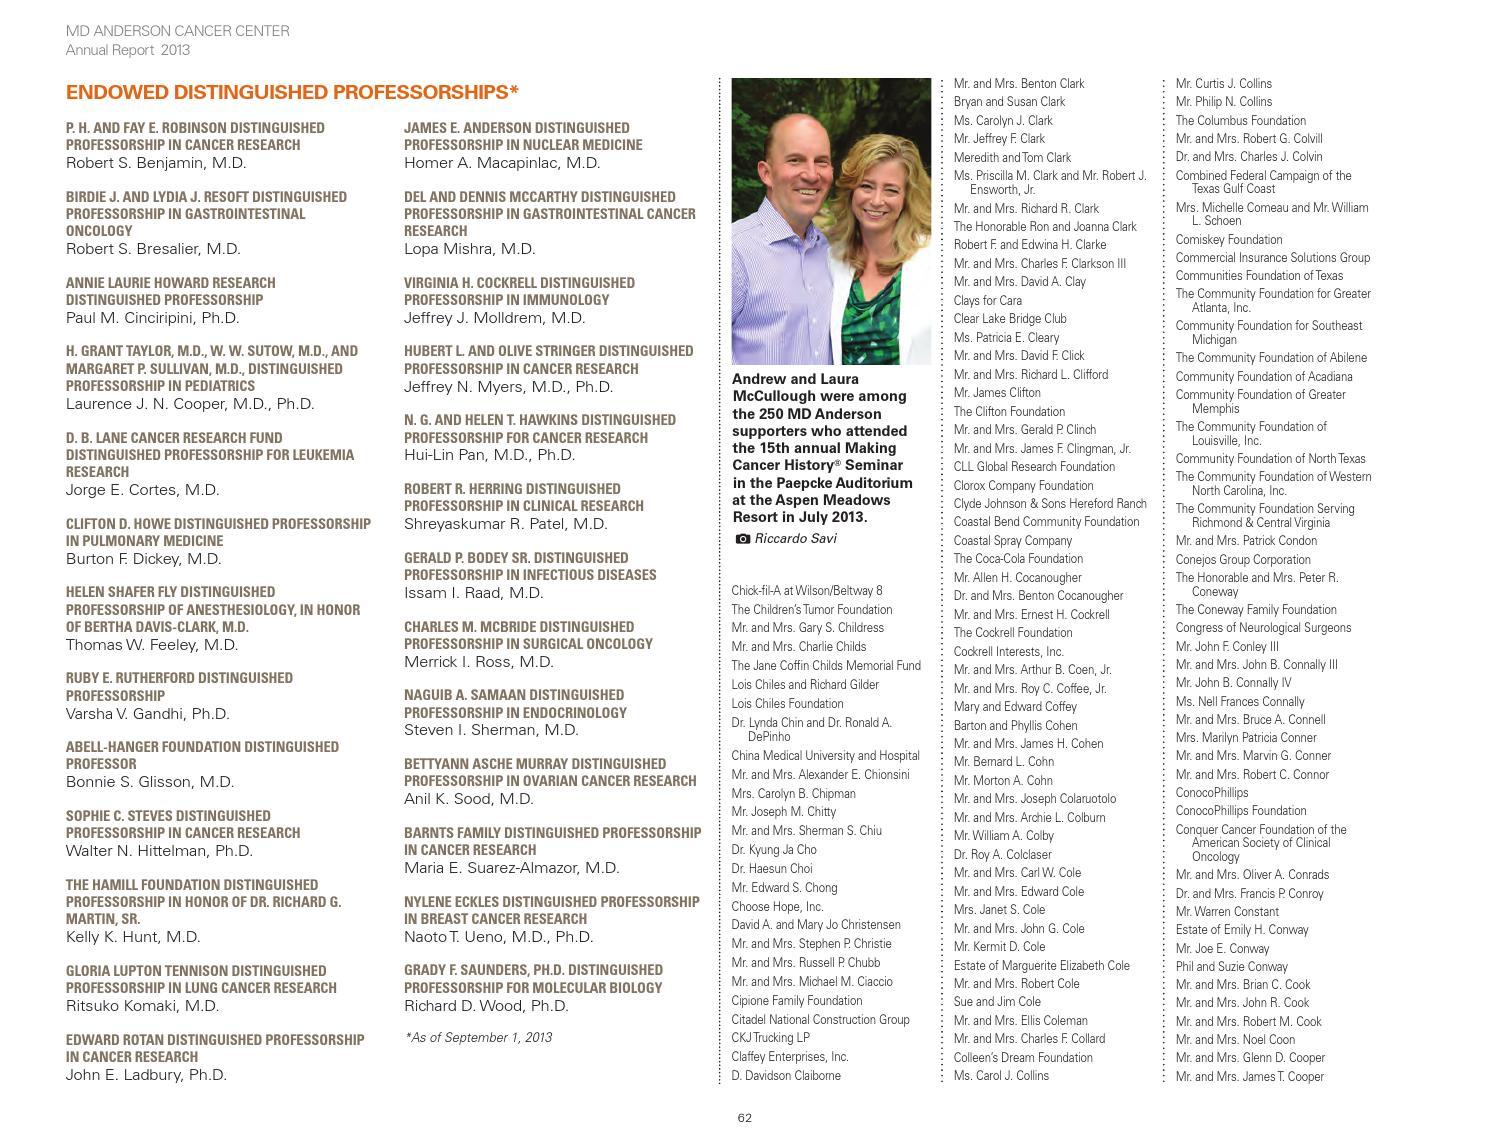 MD Anderson Annual Report 2012-2013